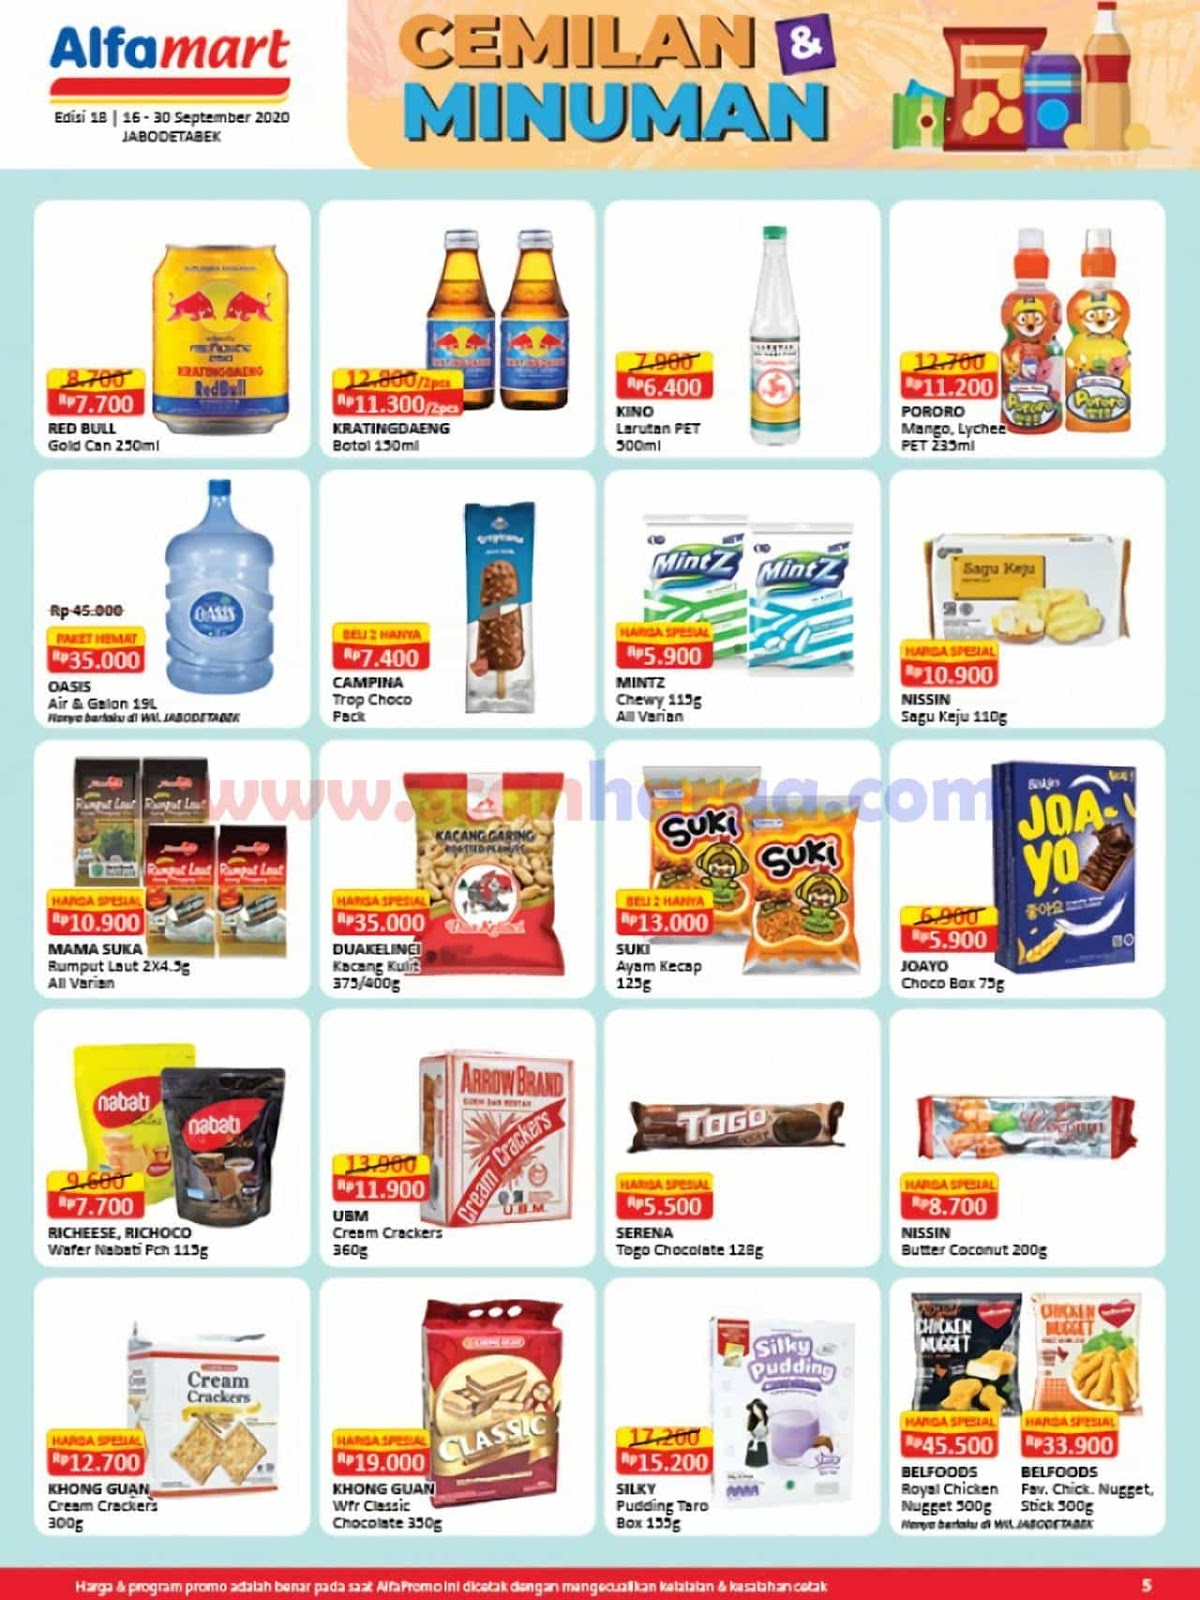 Katalog Promo Alfamart 16 - 30 September 2020 5